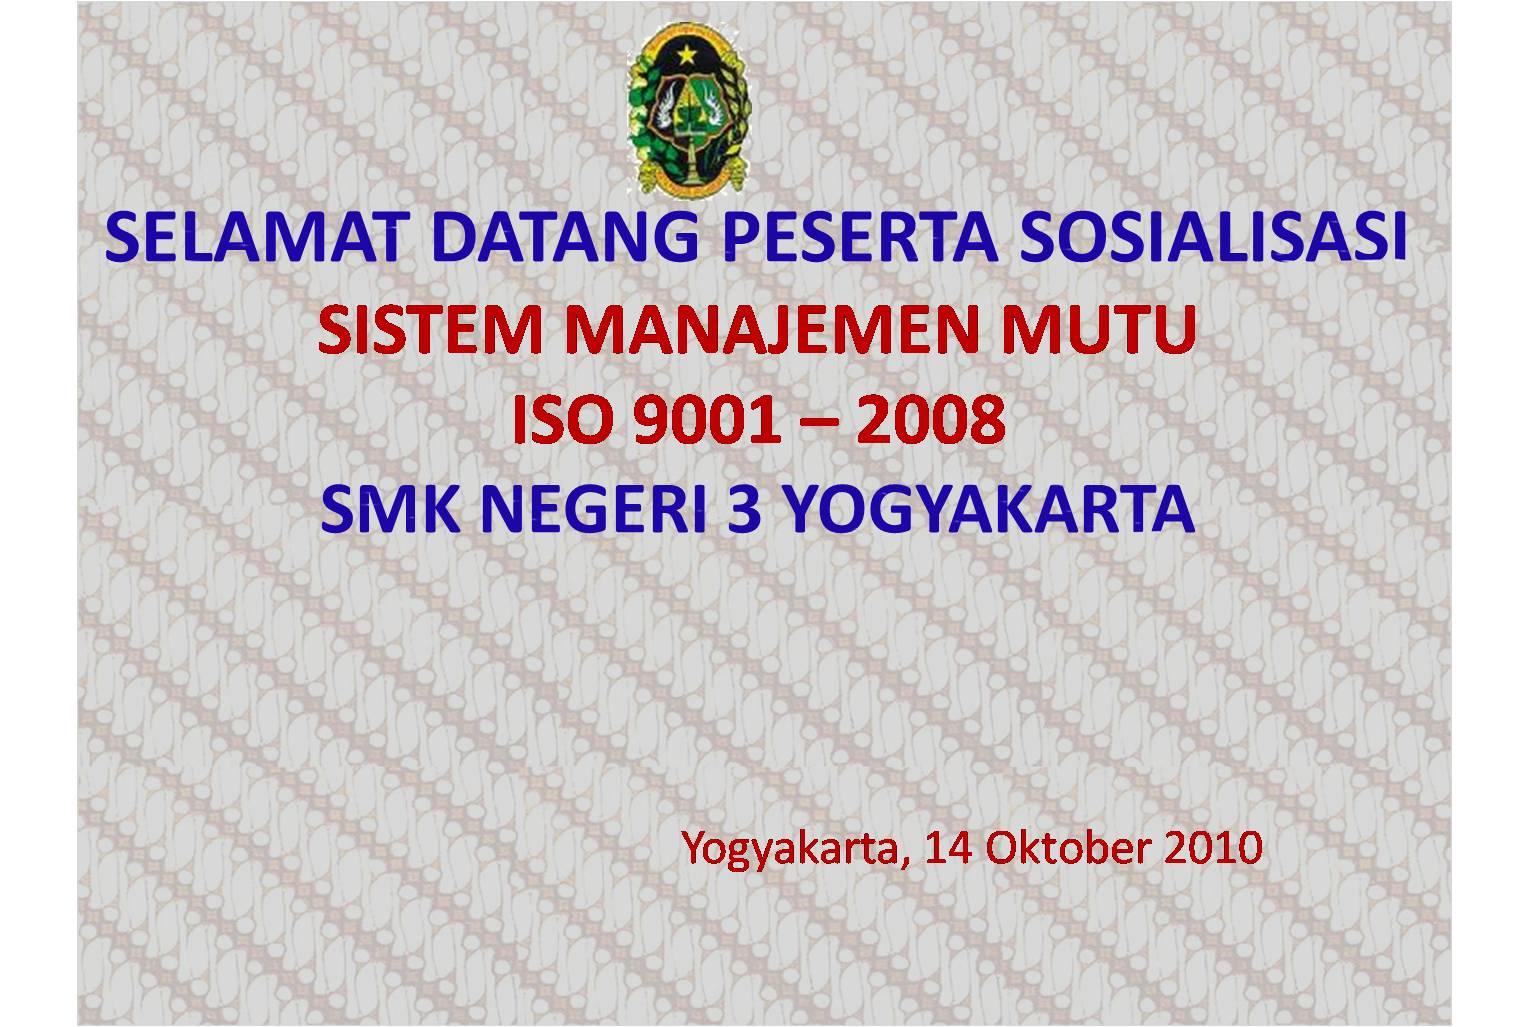 3 Tujuan Dilaksanakan Sosialisasi Politik